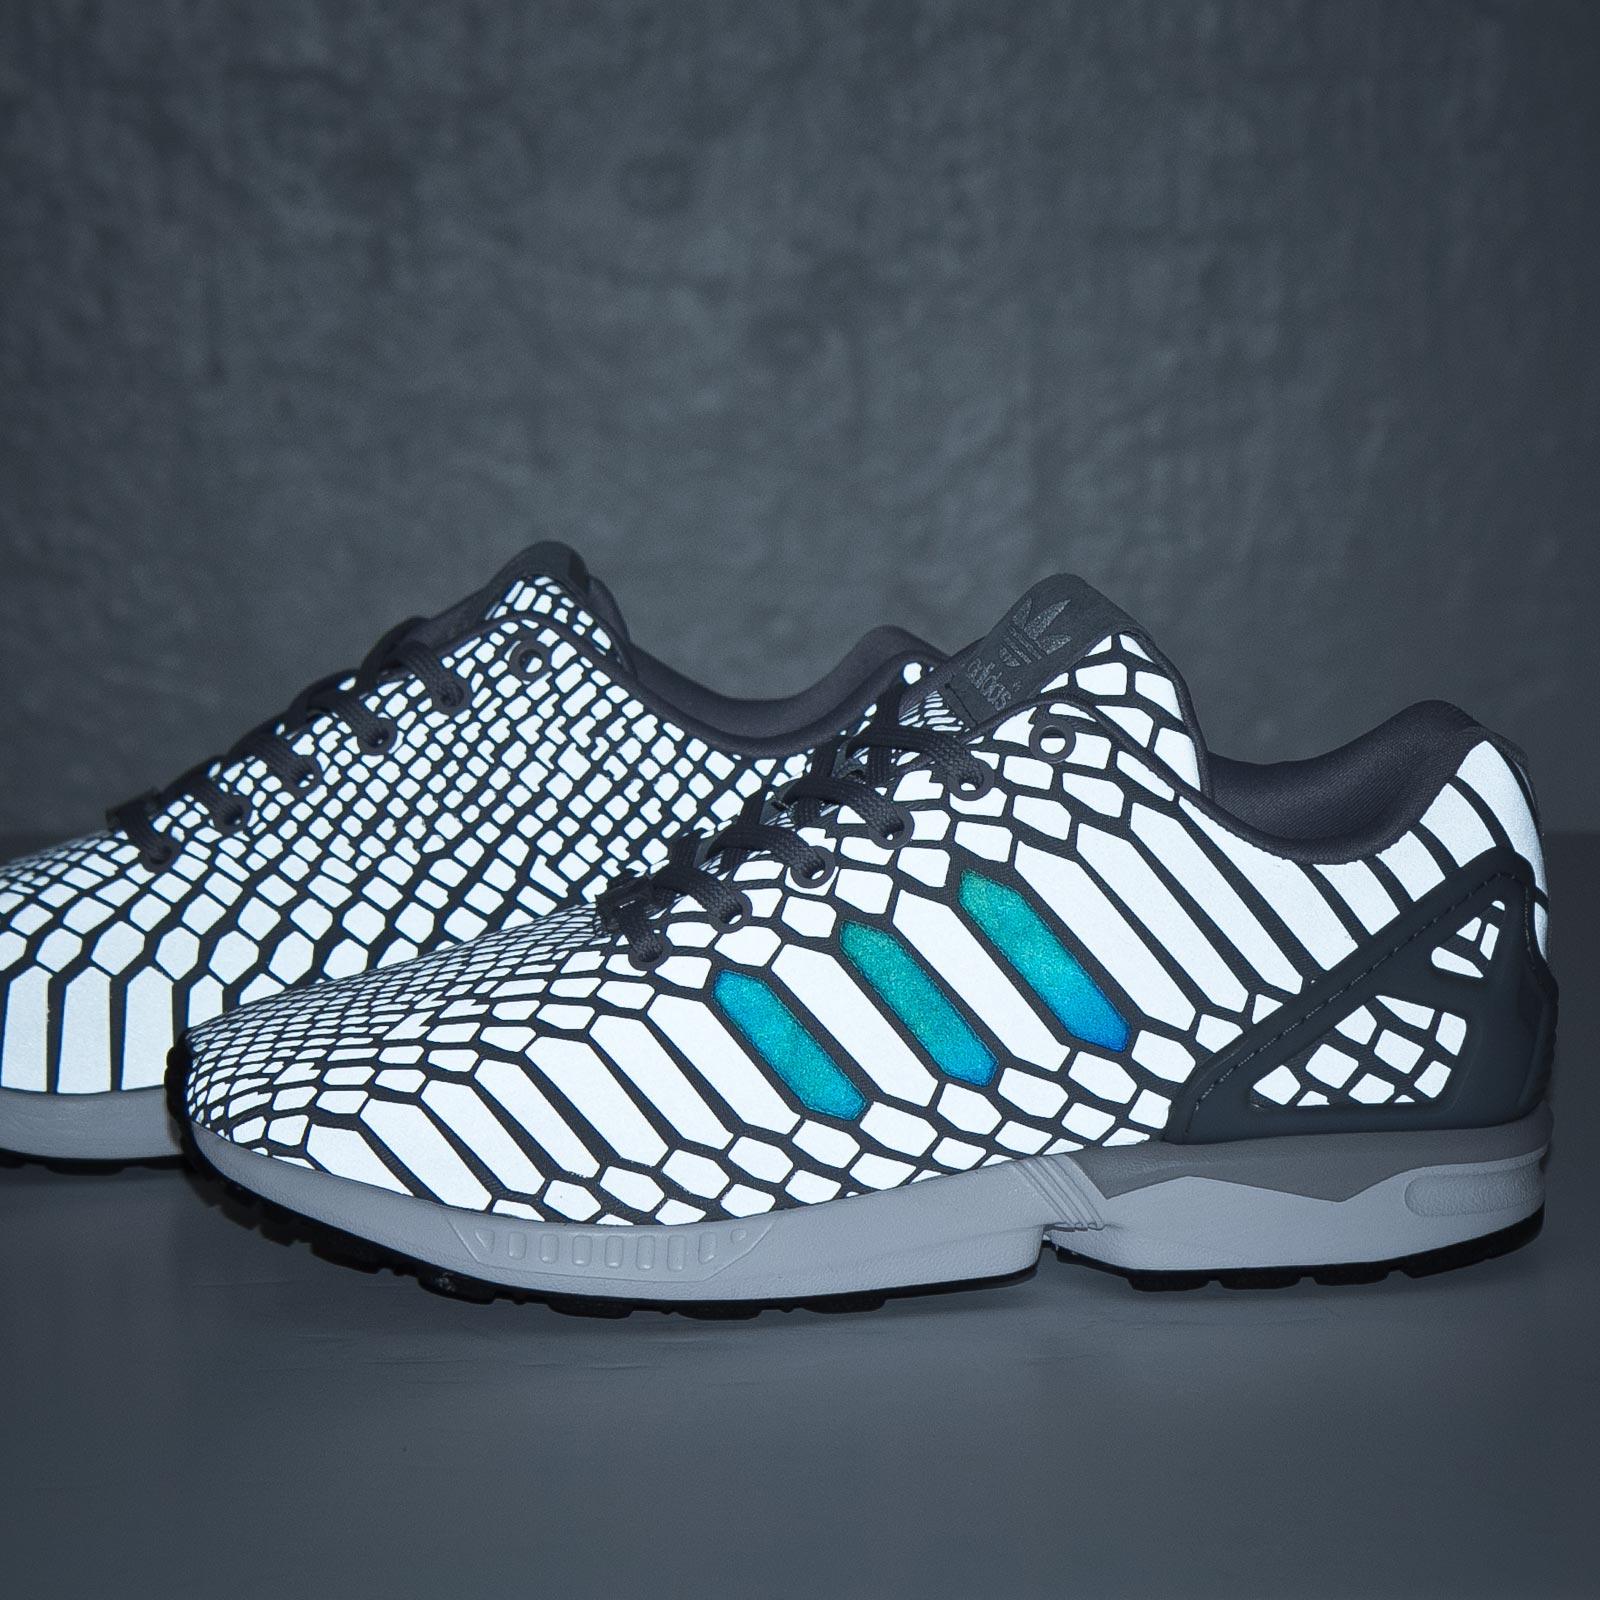 great fit d8efa a4a5b adidas ZX Flux - B24442 - Sneakersnstuff   sneakers ...